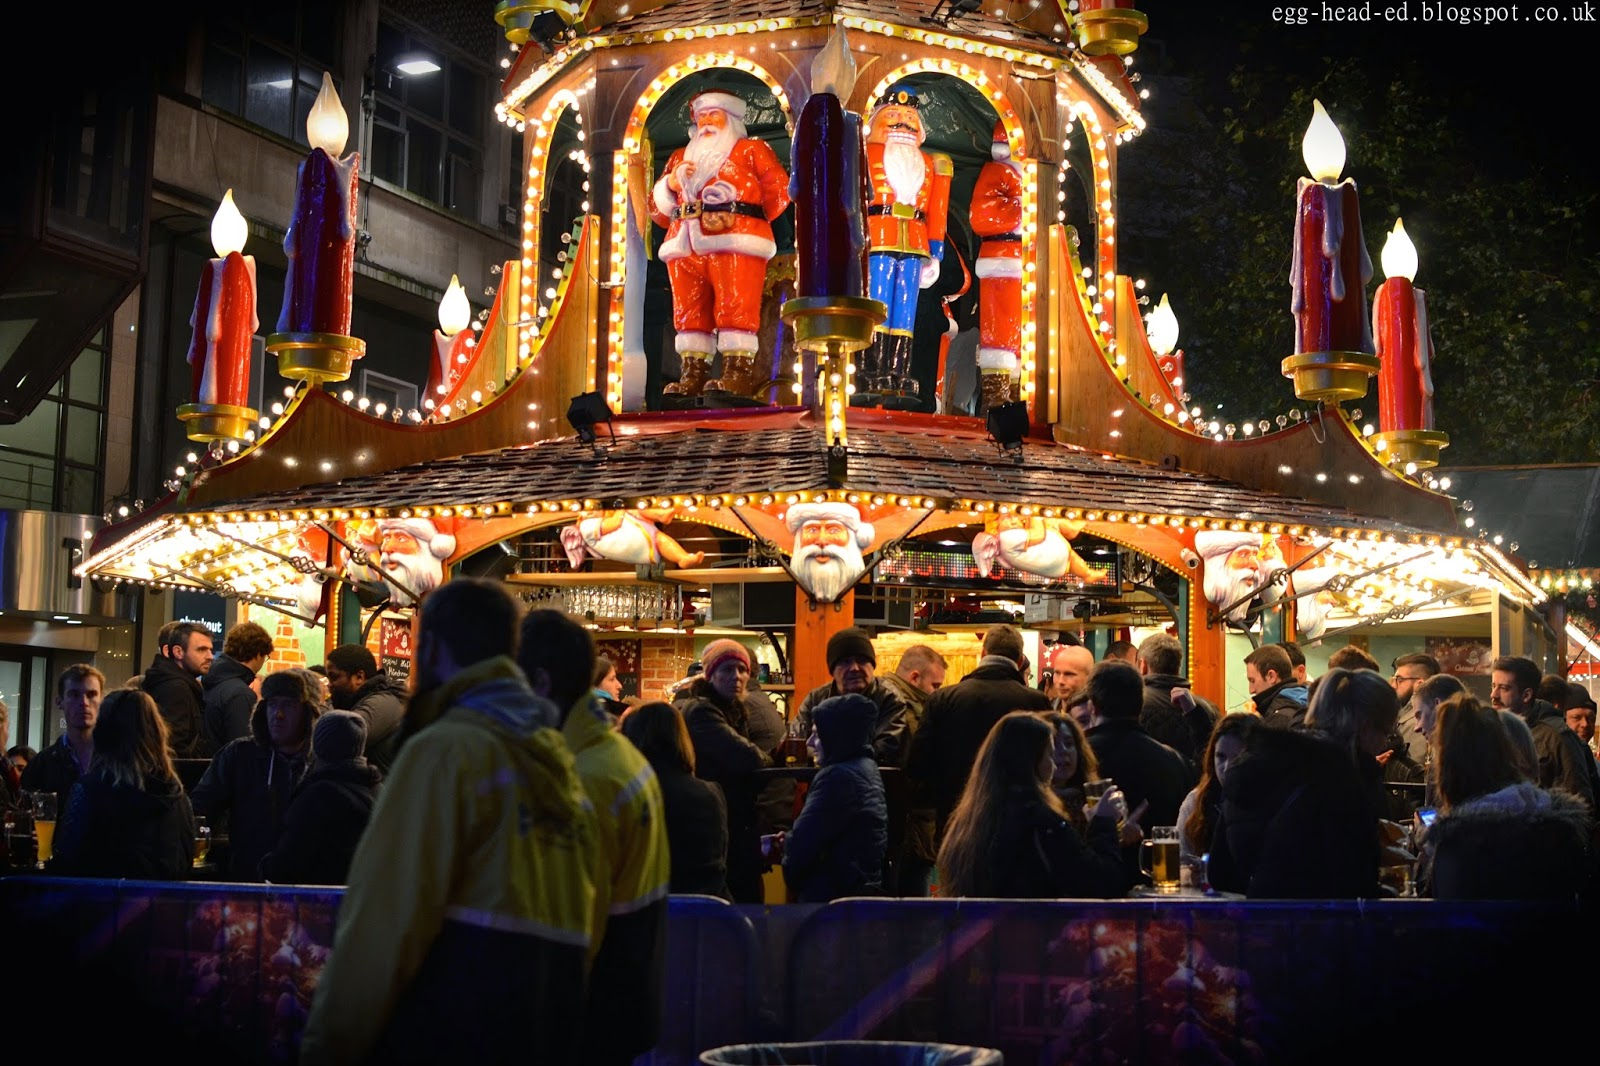 Birmingham Christmas Market Festive Lights